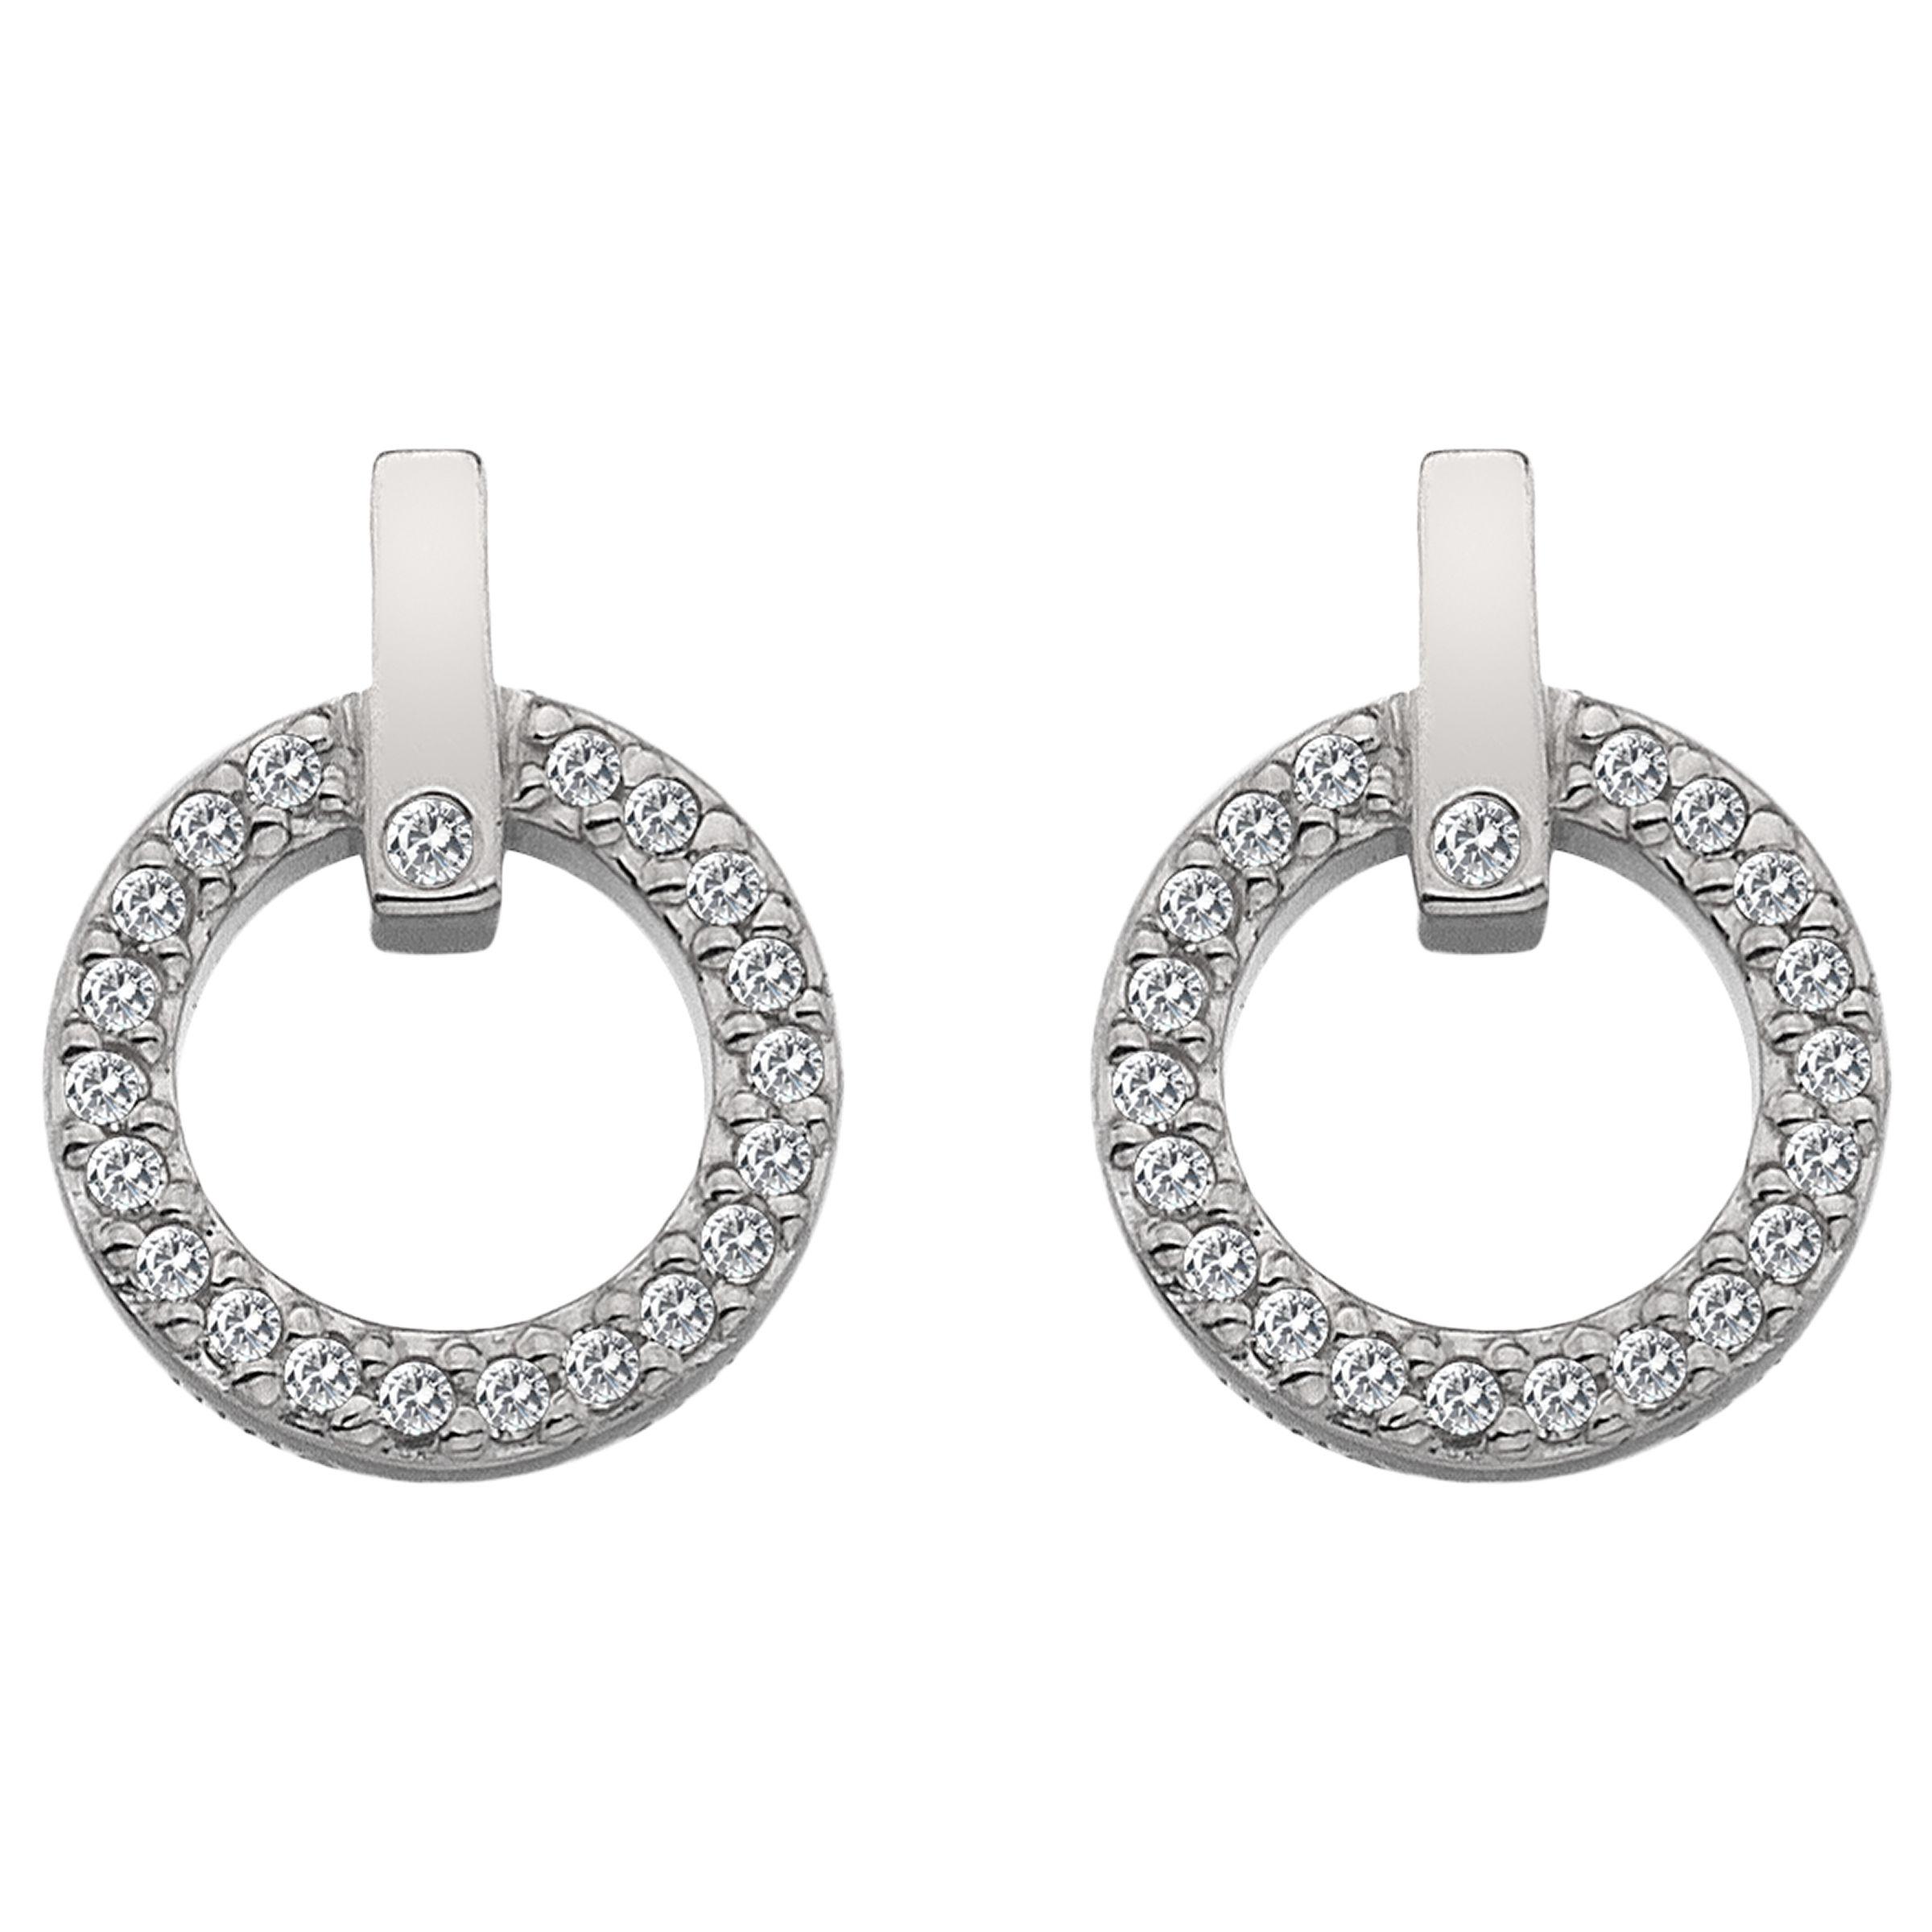 Hot Diamonds Hot Diamonds White Topaz and Diamond Circle Stud Earrings, Silver